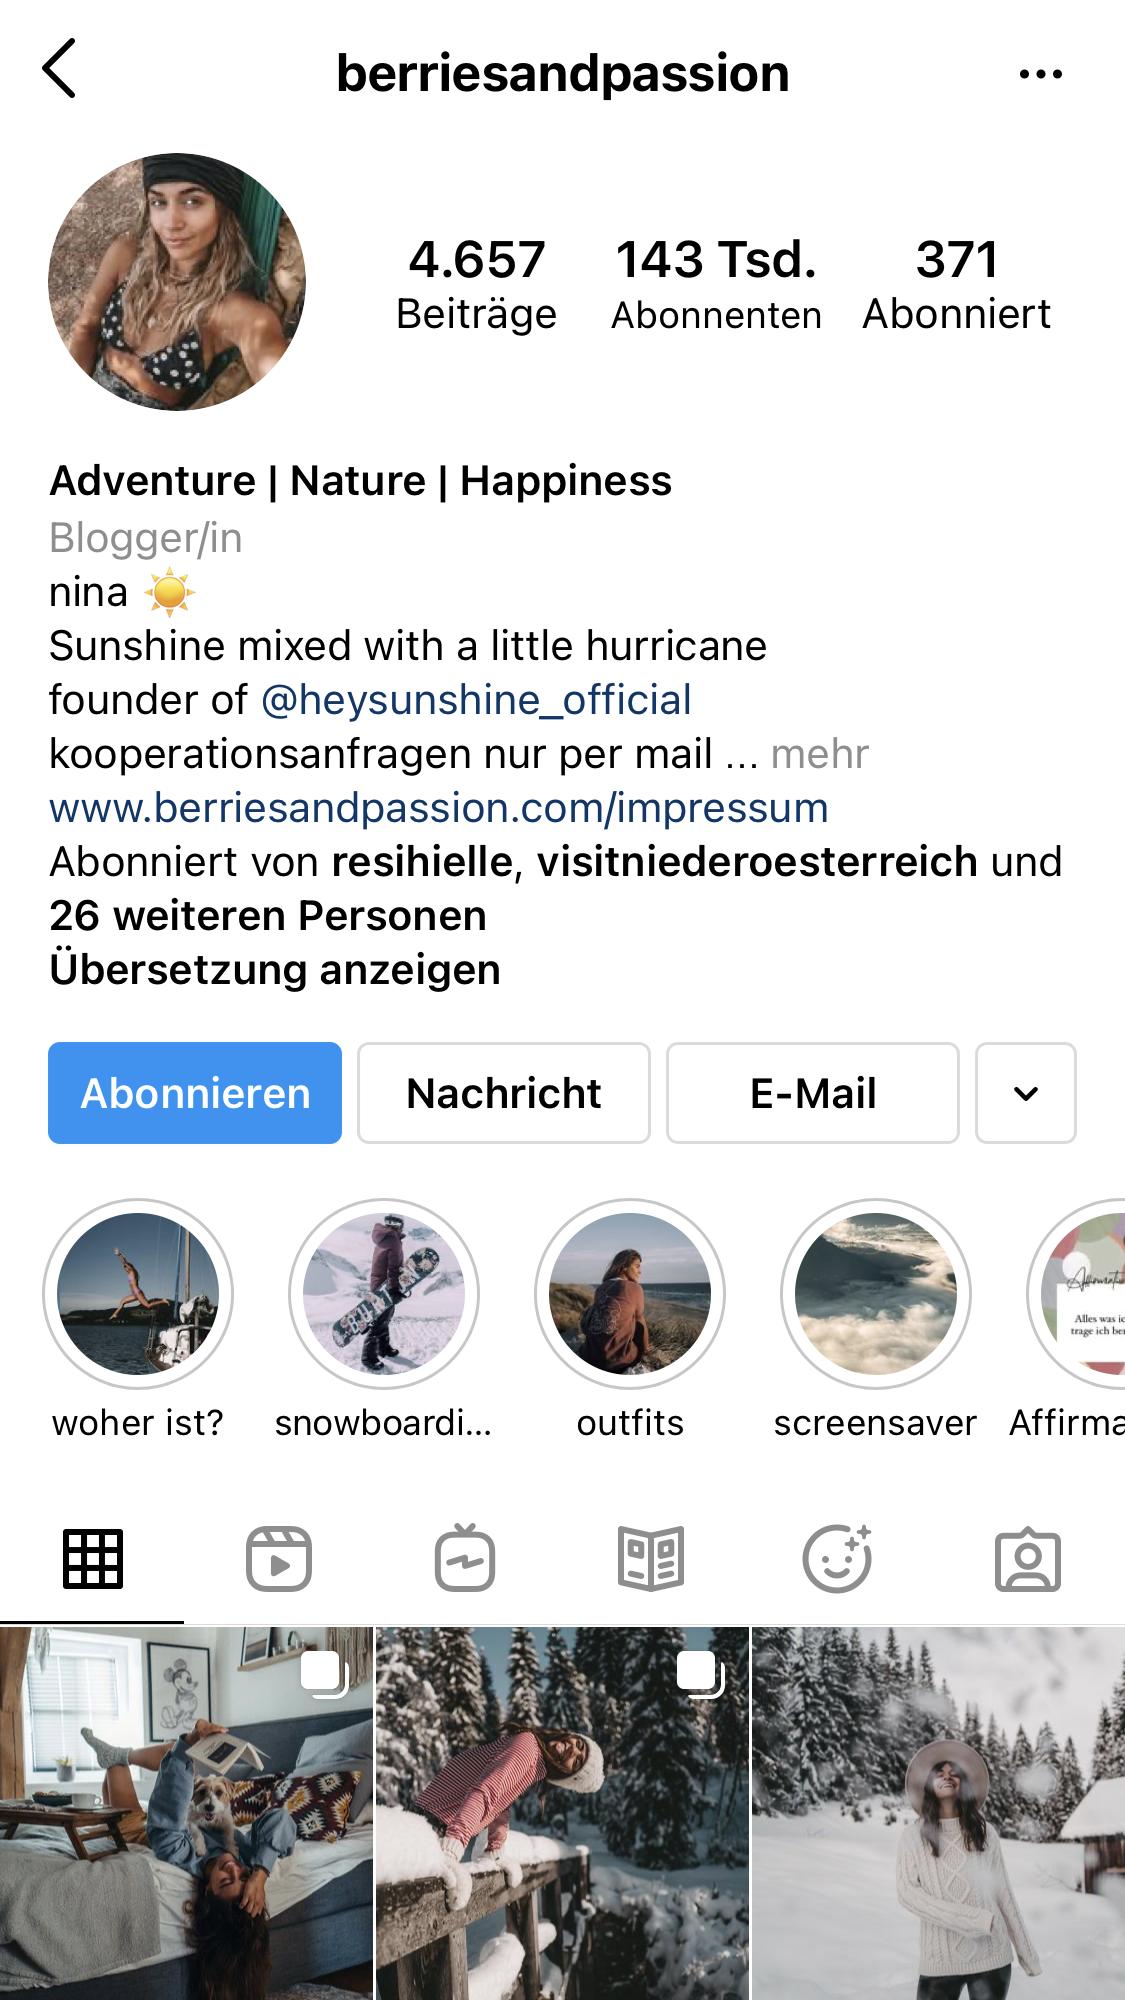 Berries and Passion - Instagram Account Sreenshot